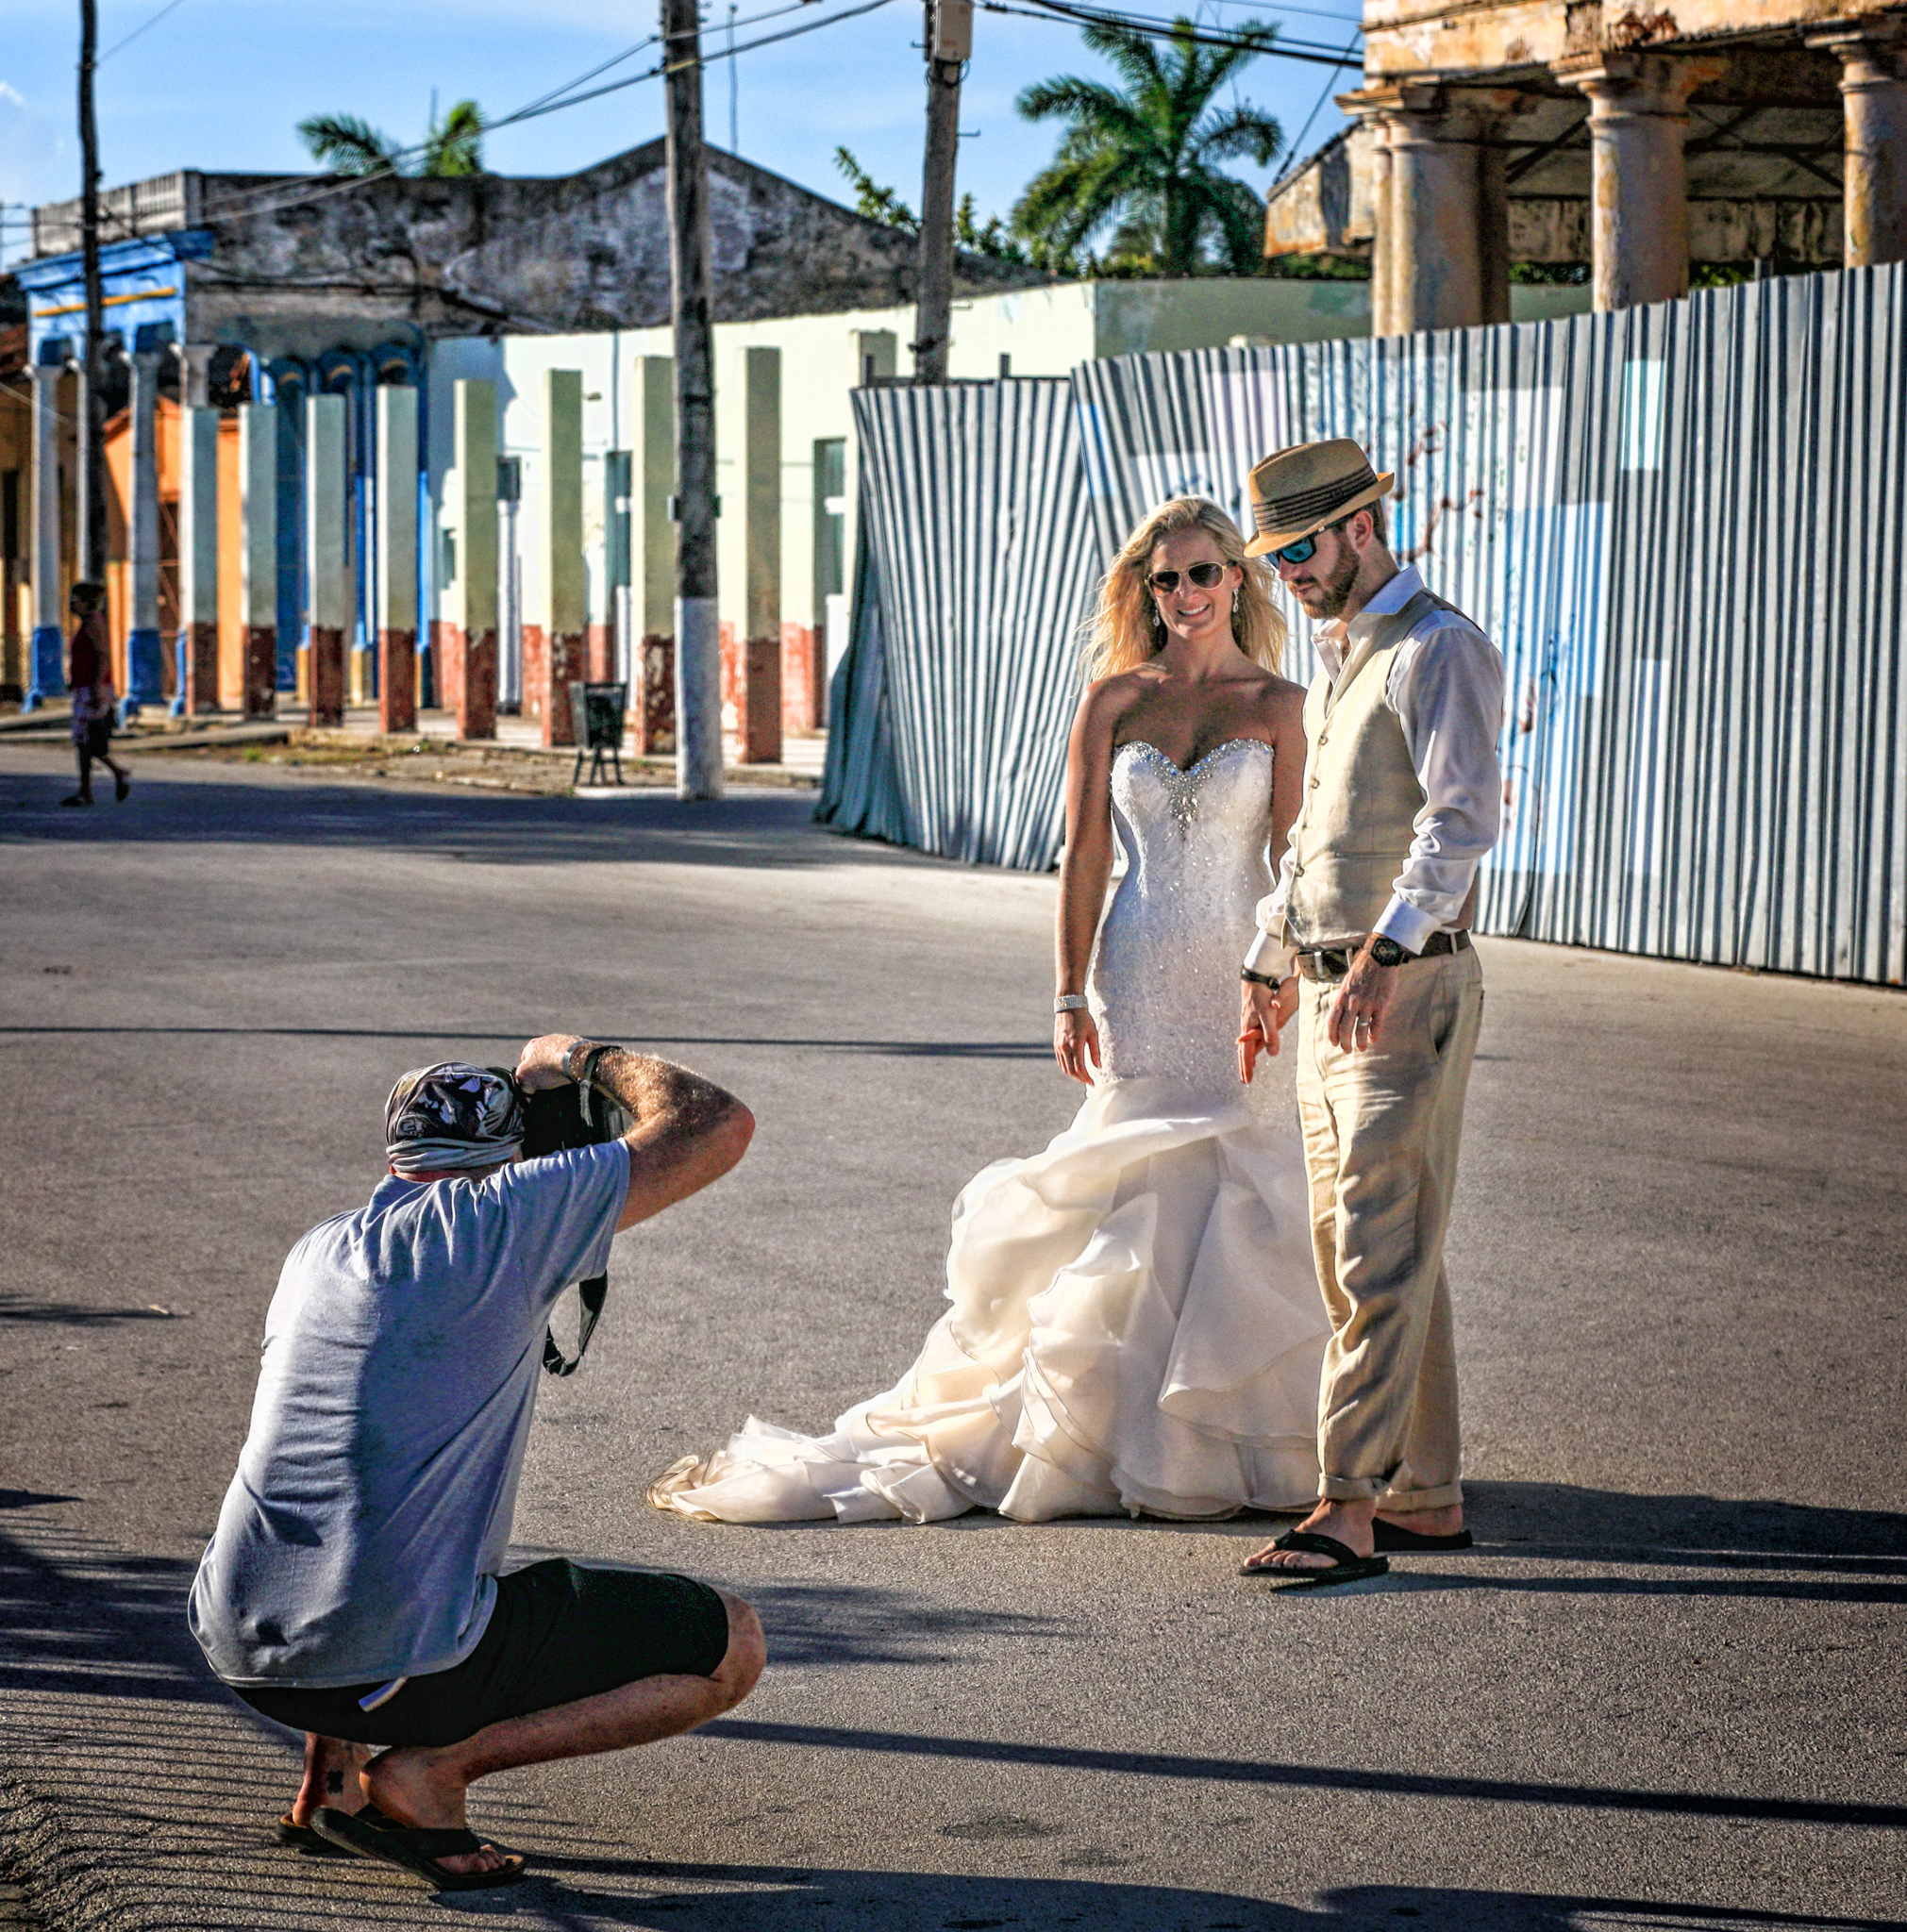 Banff wedding photographer, Troy Burnett on location in Cuba.